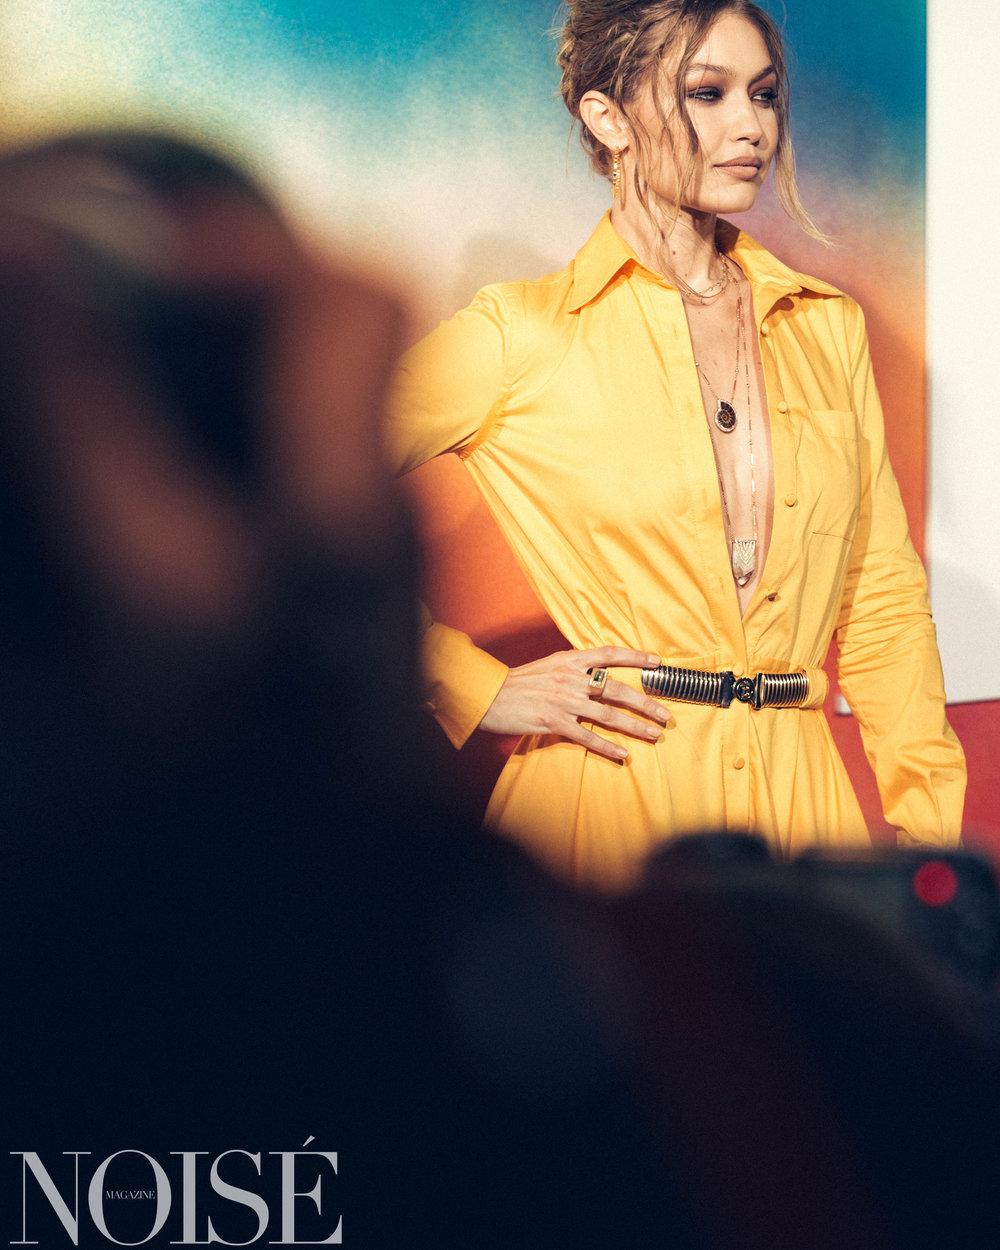 Gigi Hadid wearing Brandon Maxwell Jacquie Aiche at BoF 500 gala, Photograph by Siyu Tang for NOISÉ